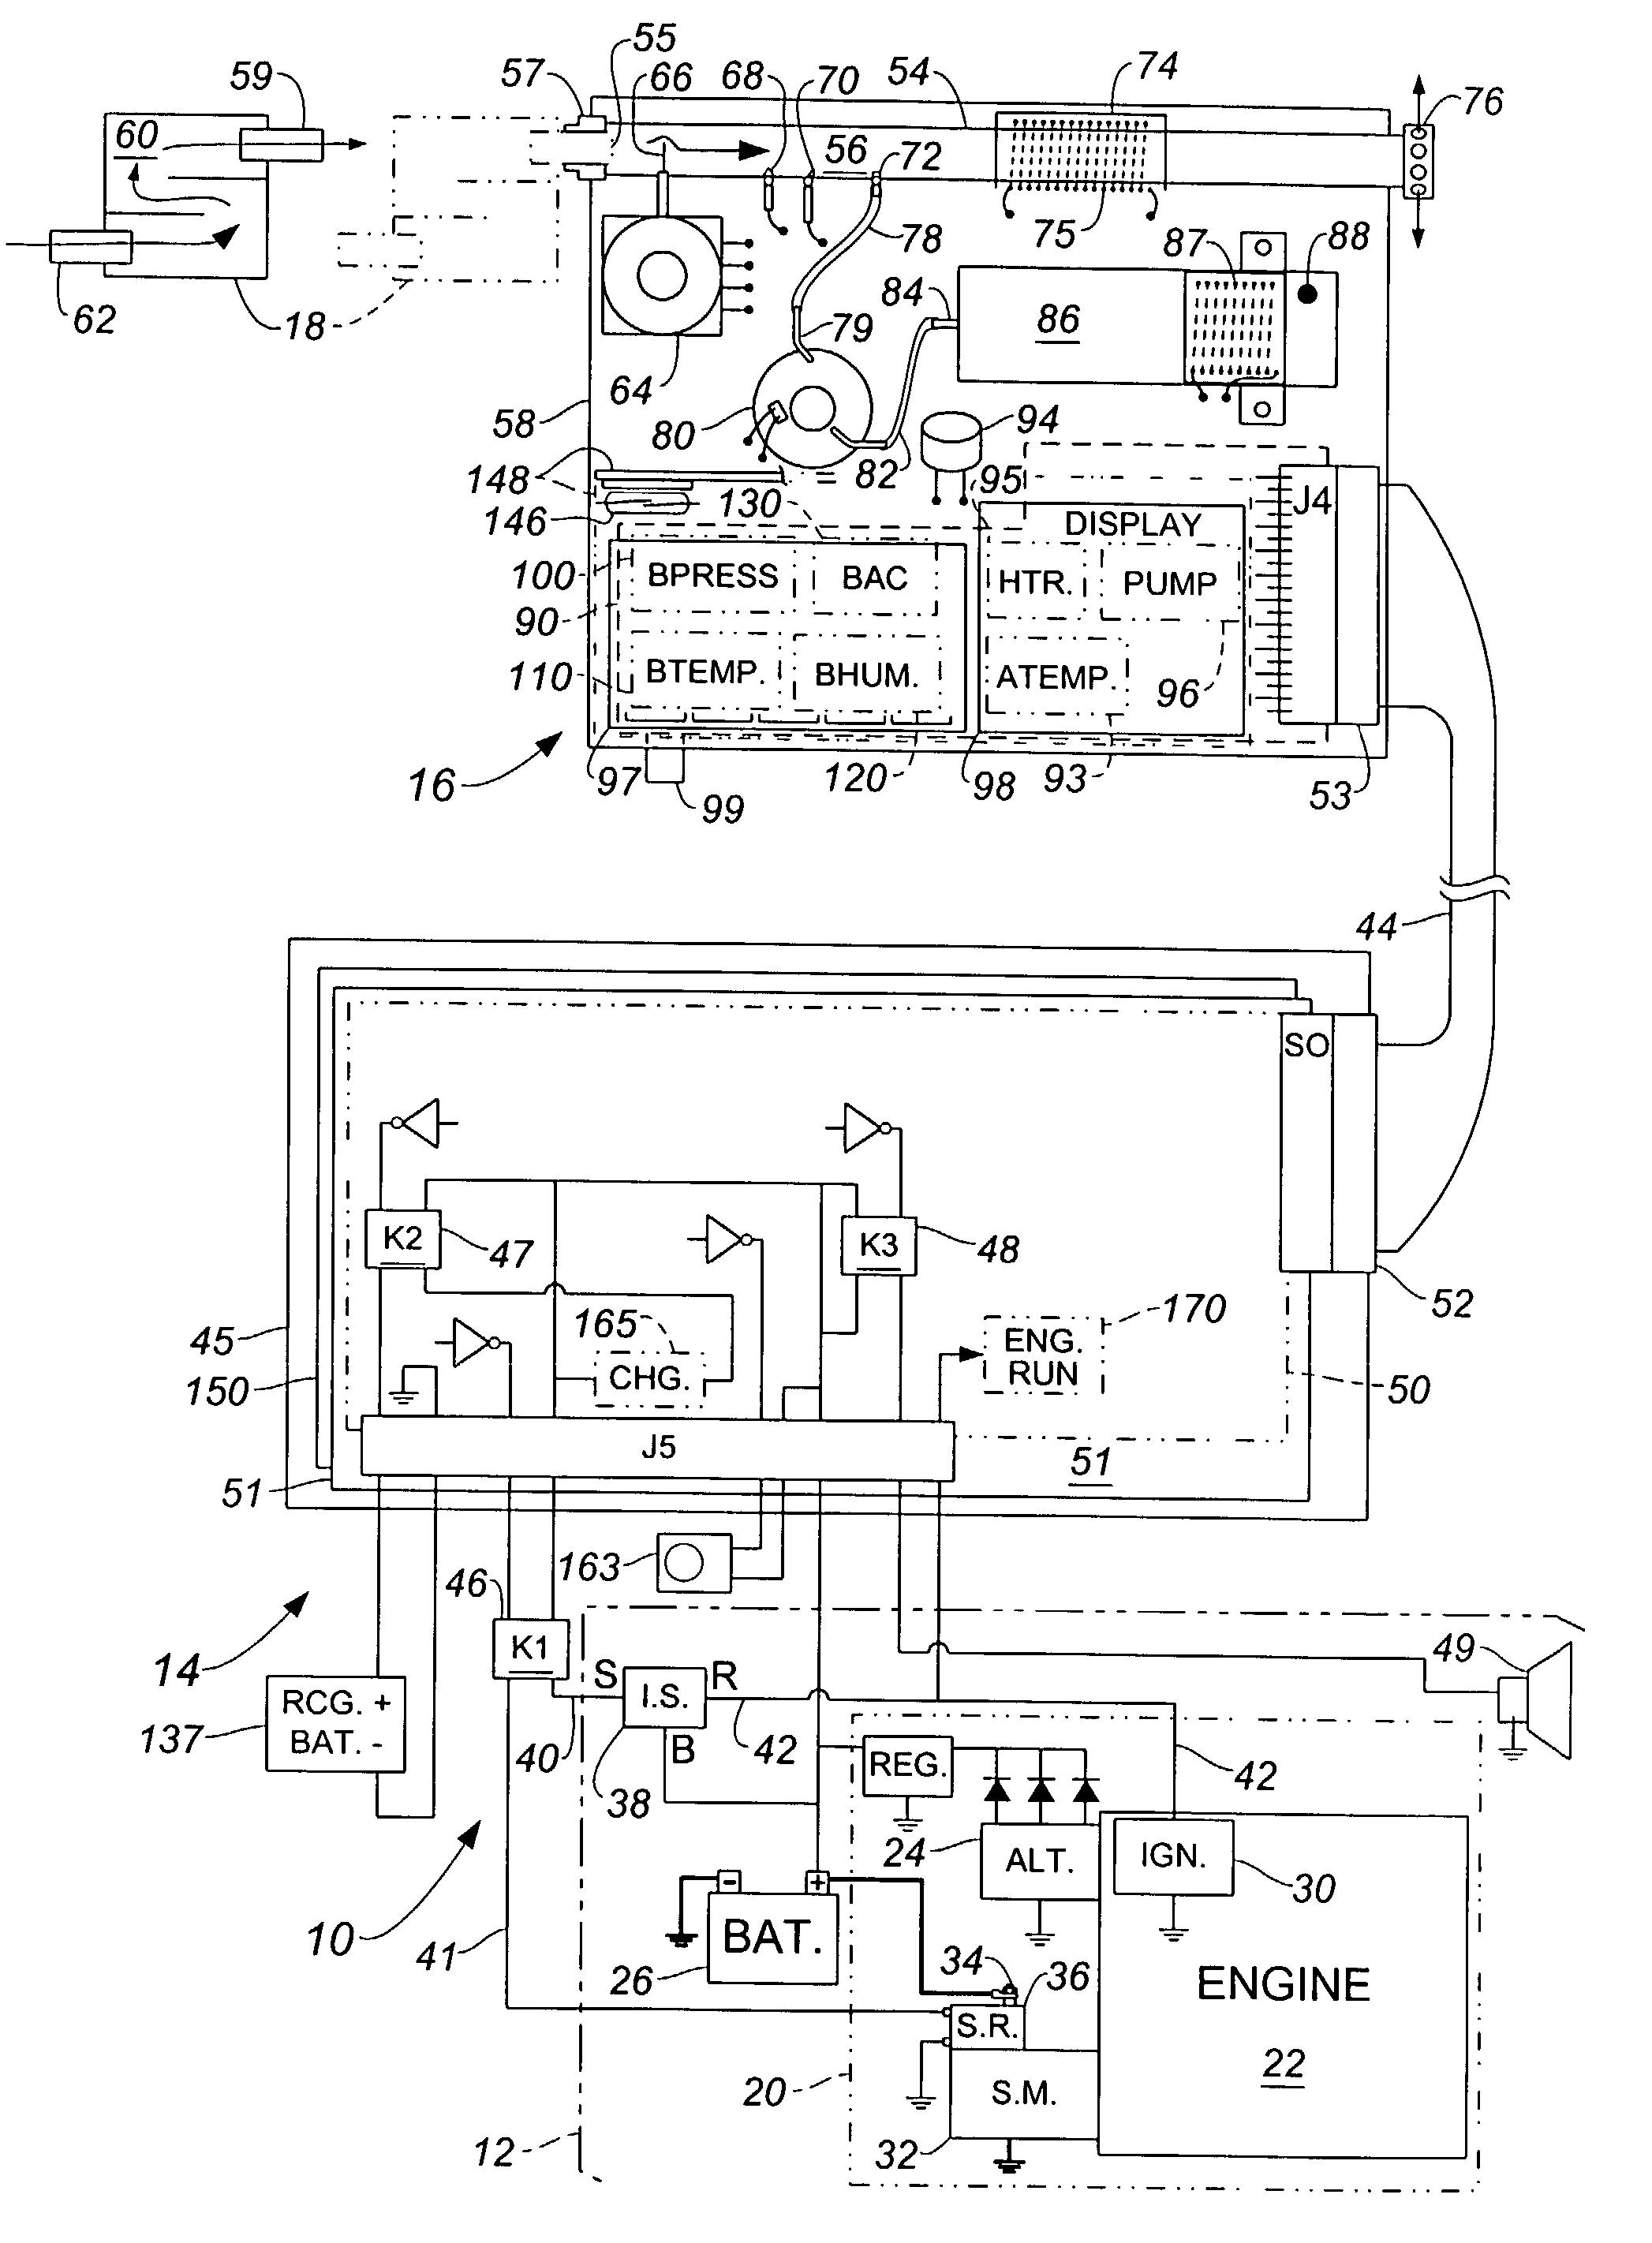 wiring diagram for 1996 club car 48 volt smart start interlock wiring diagram 36 wiring diagram iid wiring diagram